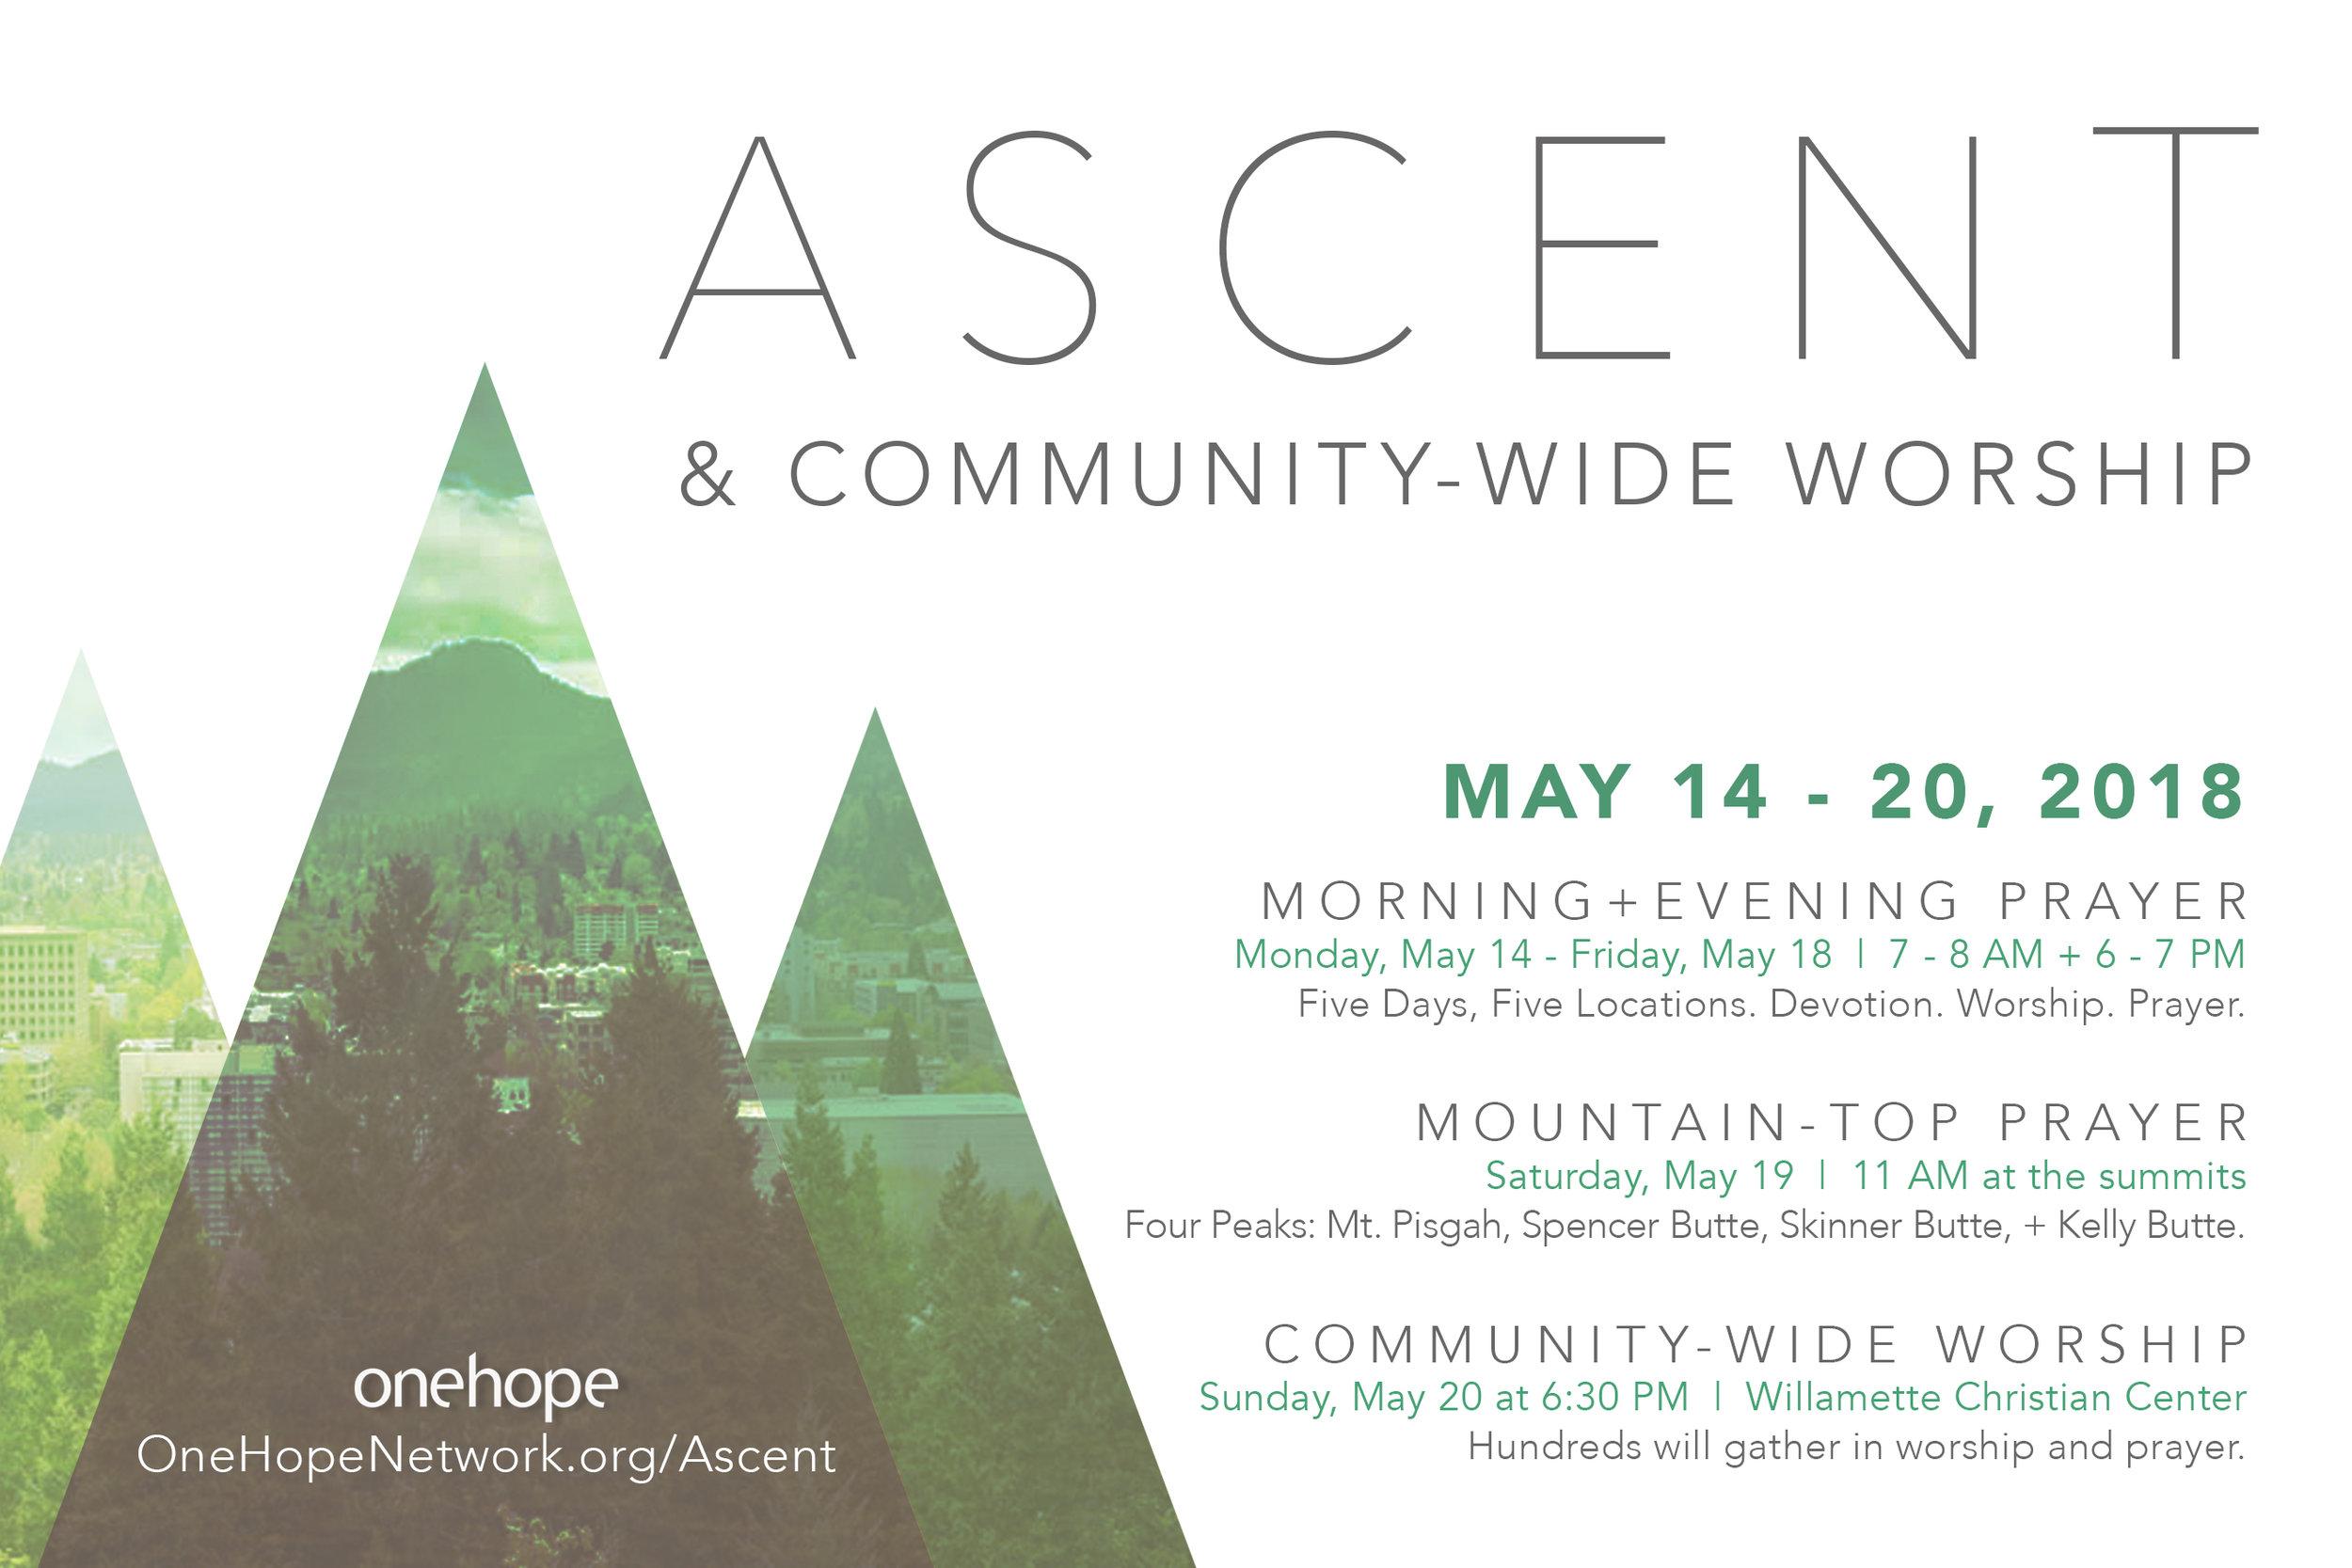 Ascent Postcard 2018 front FINAL.jpg